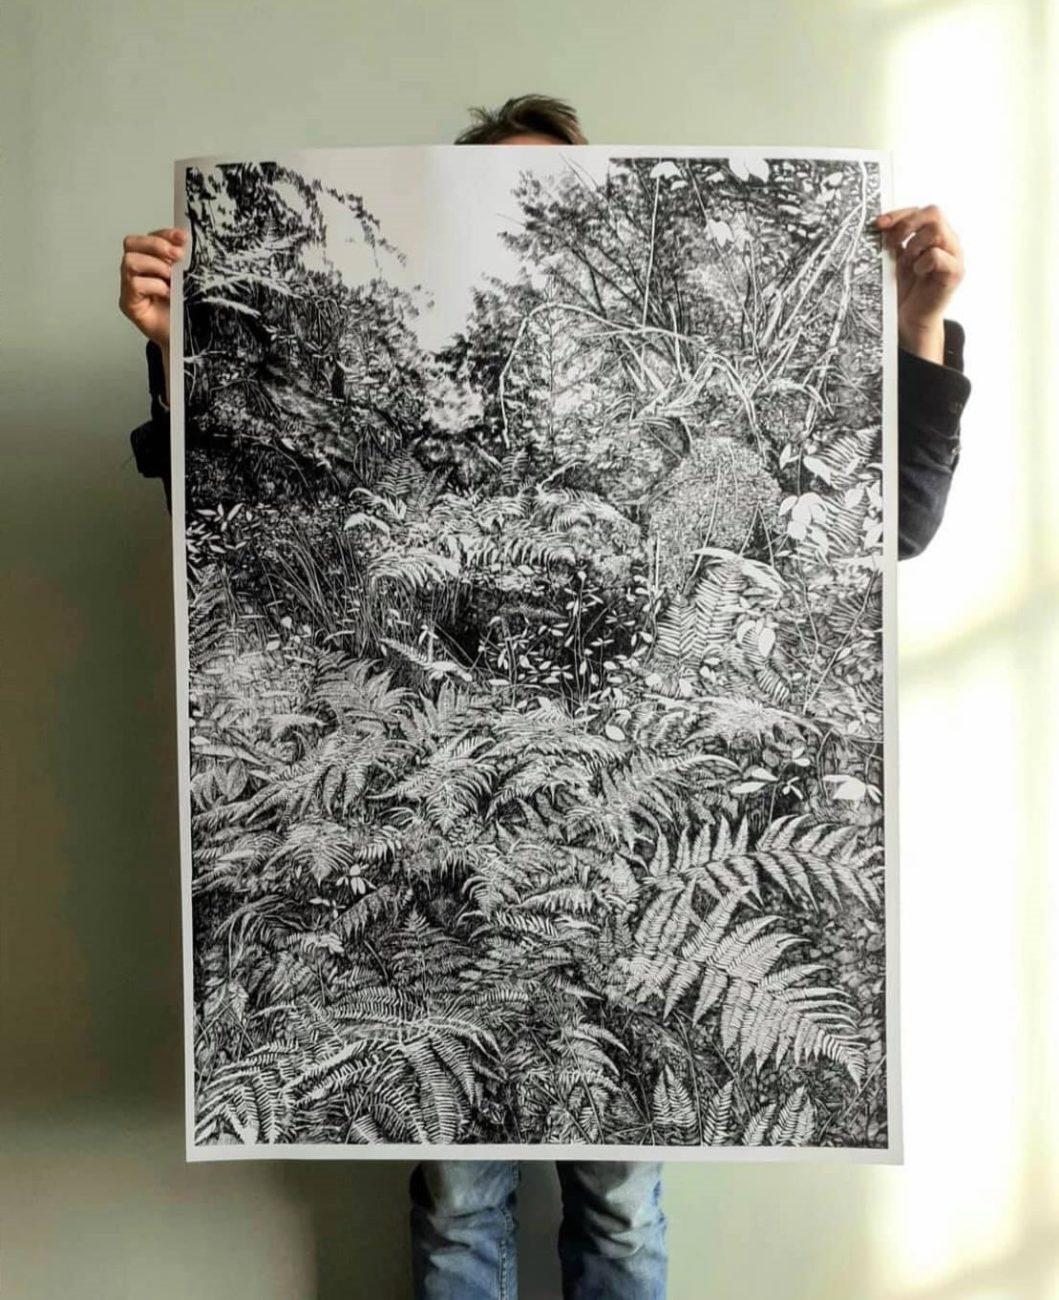 Serigraphy, henninger, urwald, forest, french, art